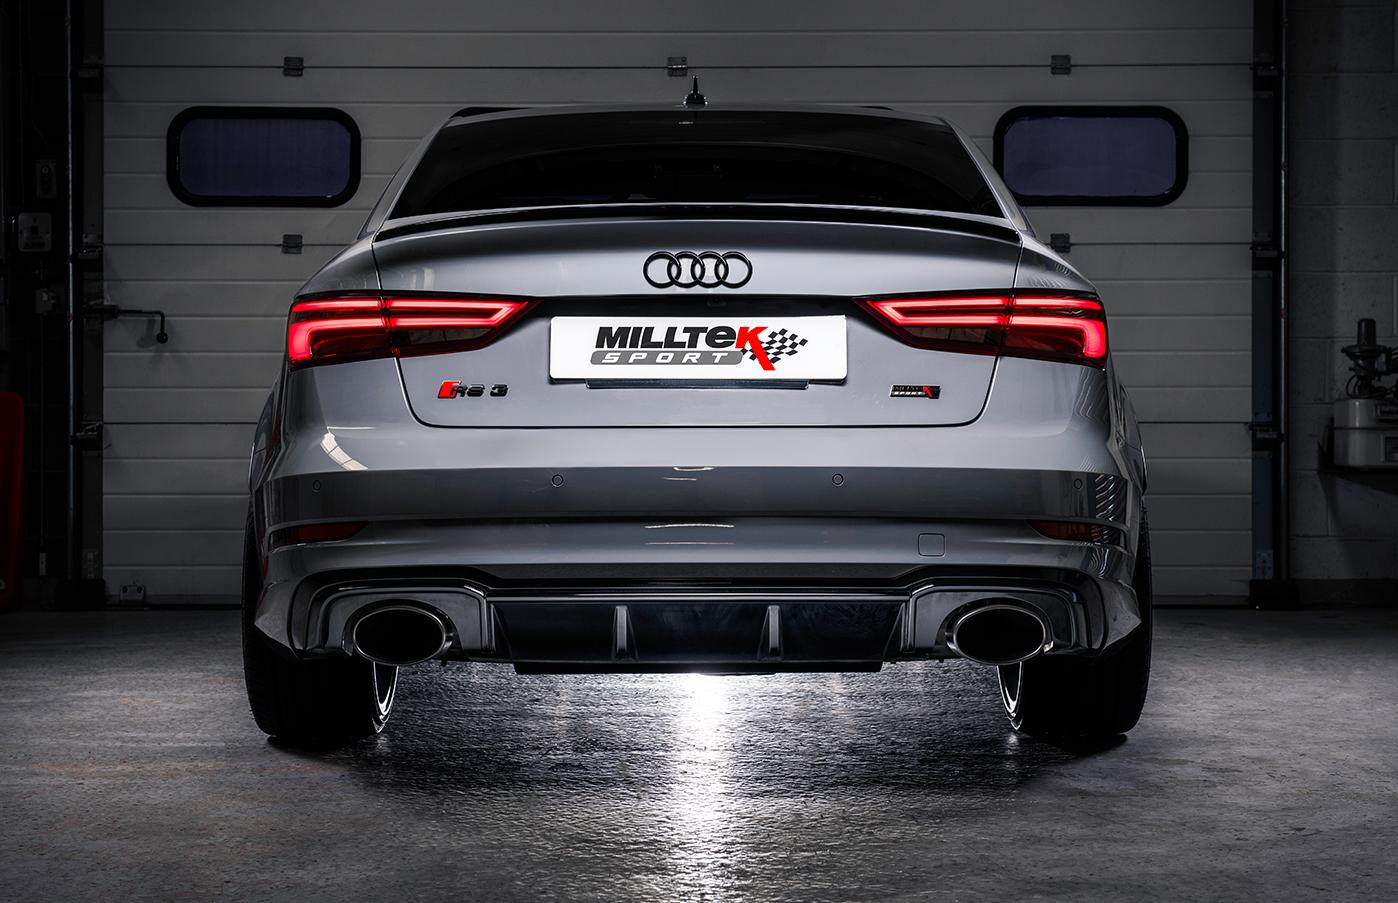 Milltek Sport Unveils New Cat-Back Exhaust For Audi RS3 Saloon (8V MQB)